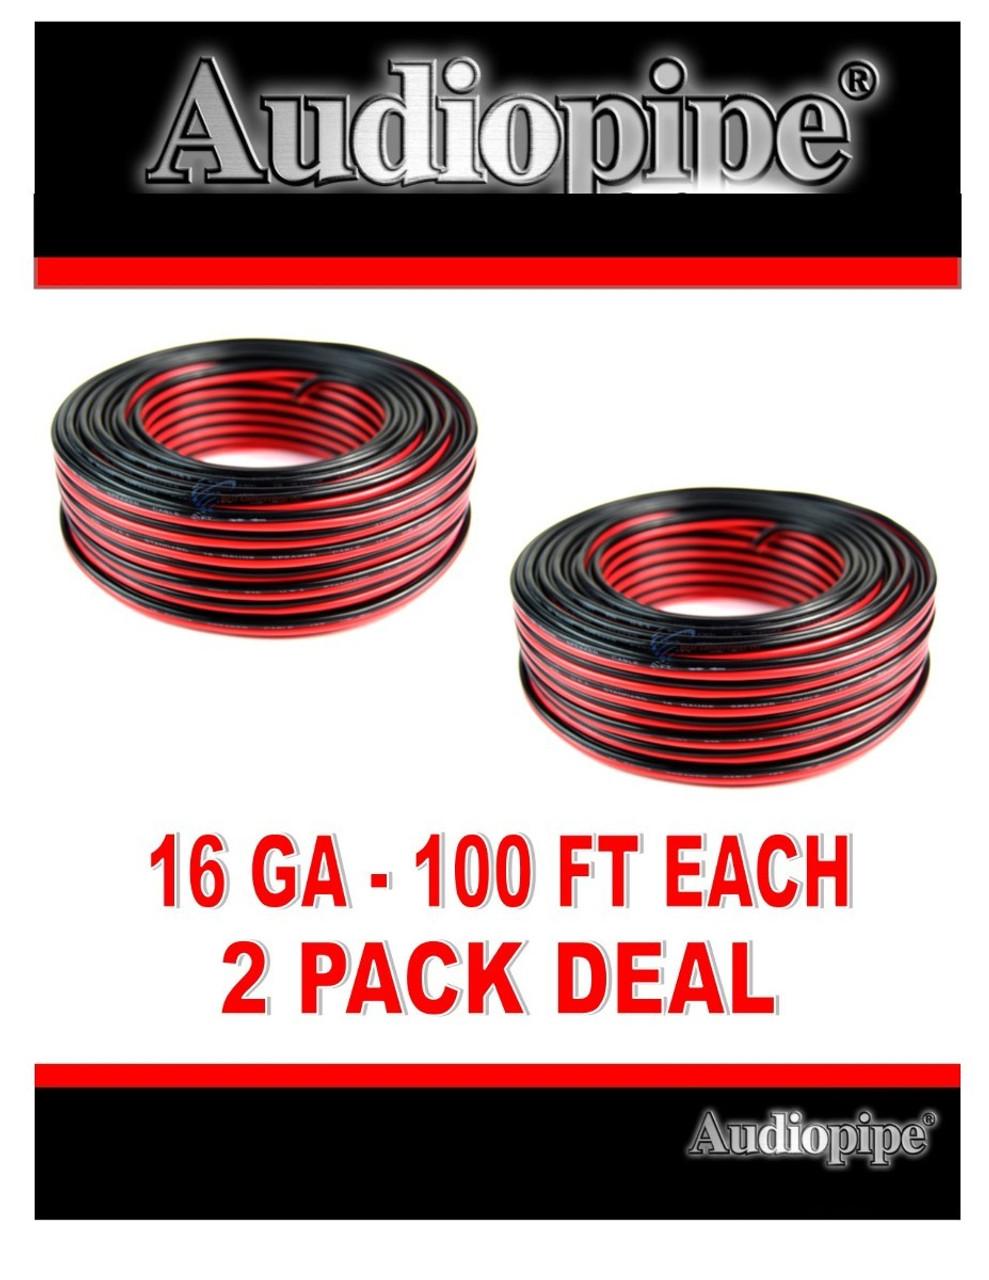 Audiopipe 12 Gauge 250 Feet Speaker Wire Red Black 2 Conductor Copper Clad Zip Cord